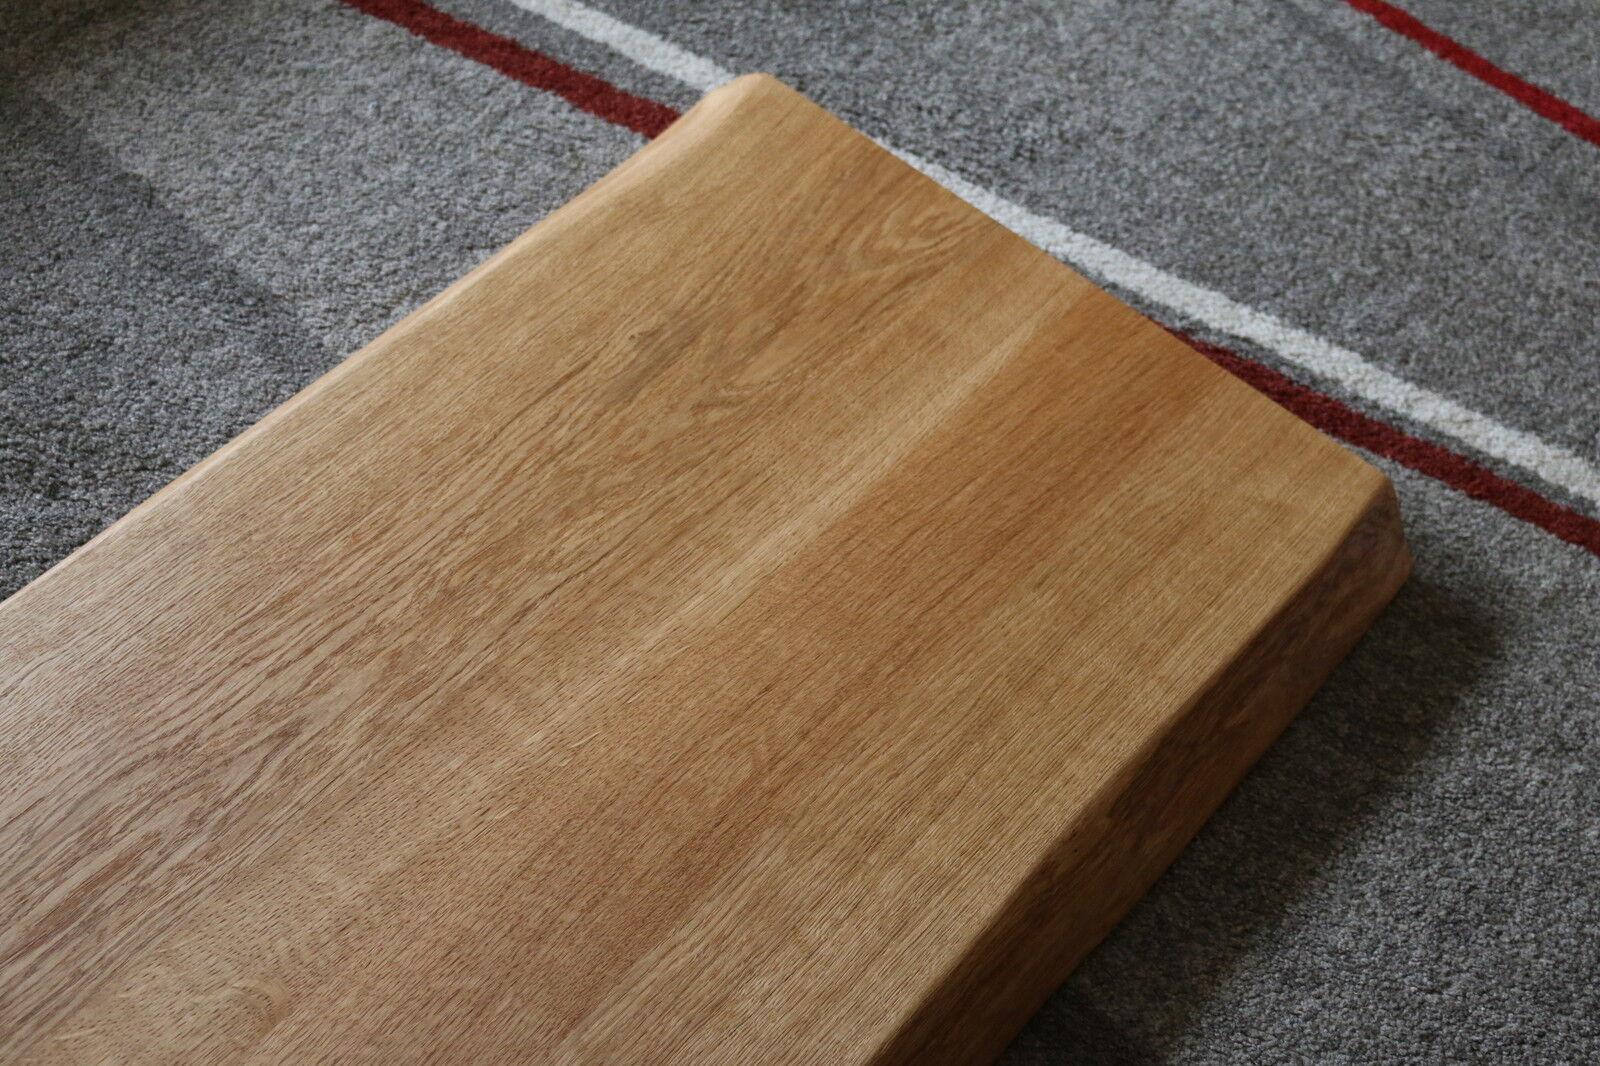 Tischplatte Platte Eiche Massiv Holz Tisch Brett Leimholz